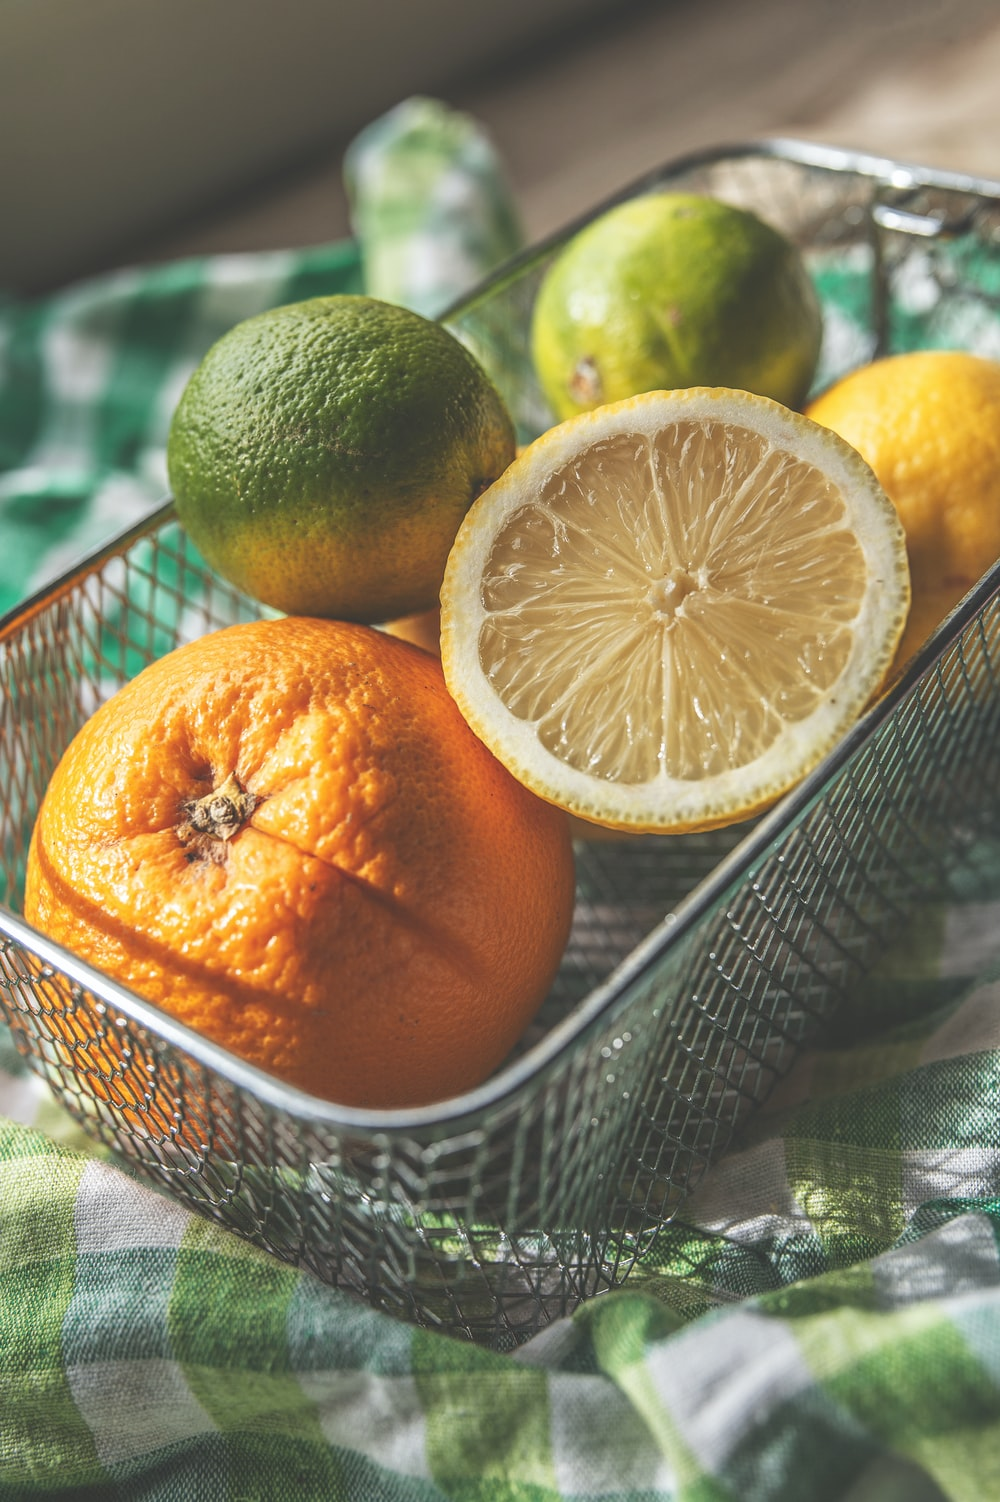 lemons and oranges in basket